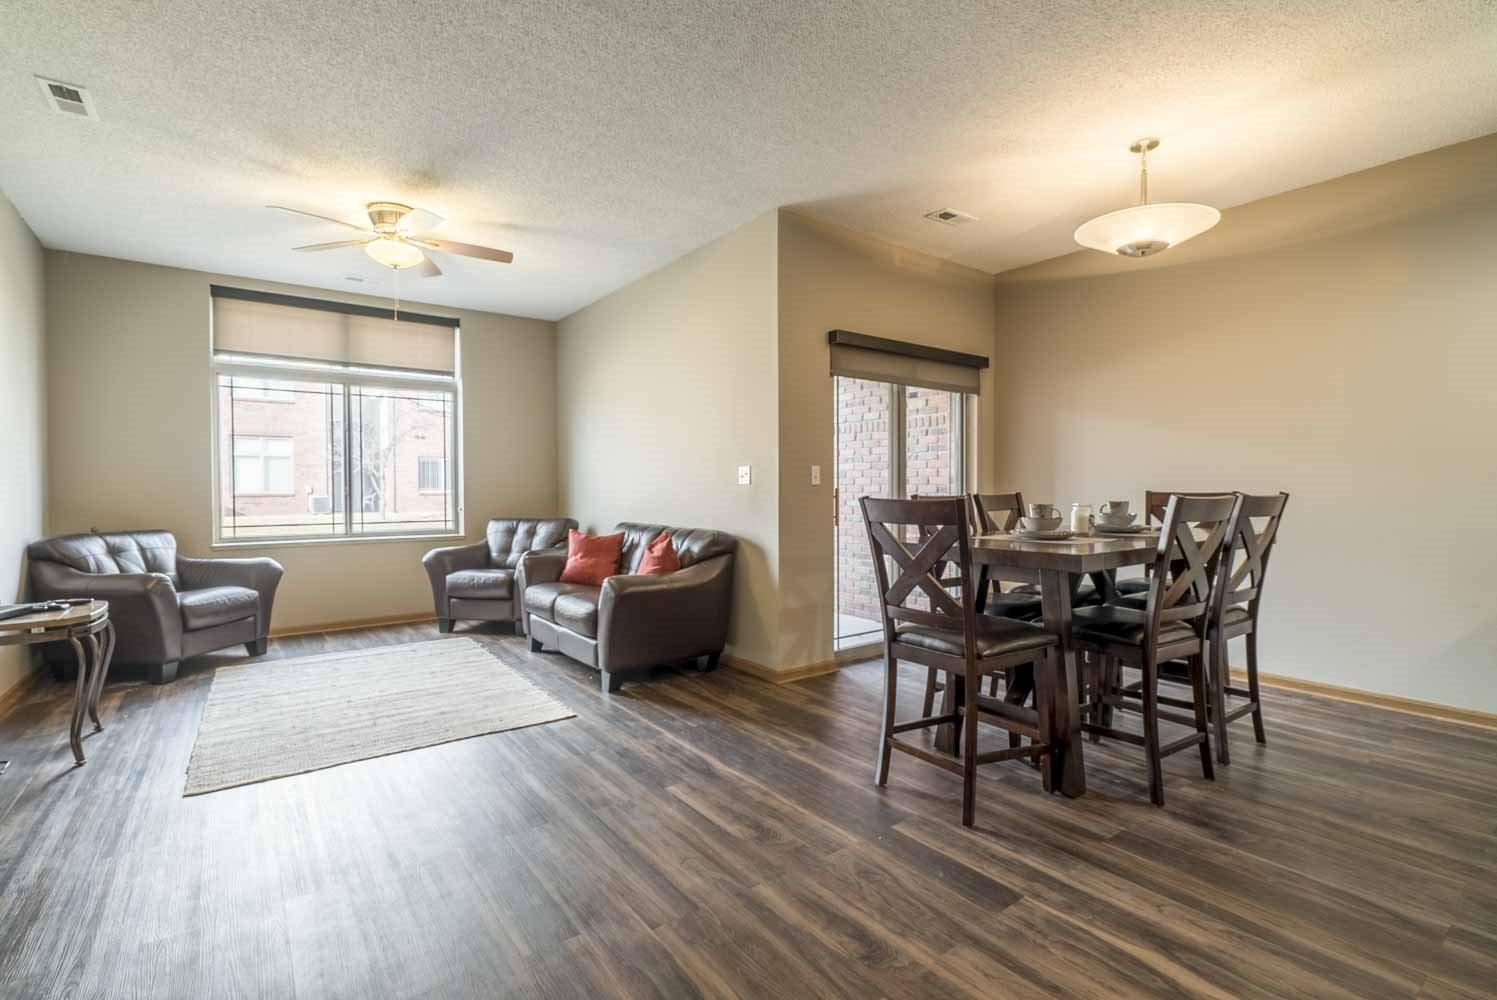 Townhome villa with hardwood-style floors at Southwind Villas in southwest Omaha in La Vista, NE, 68128